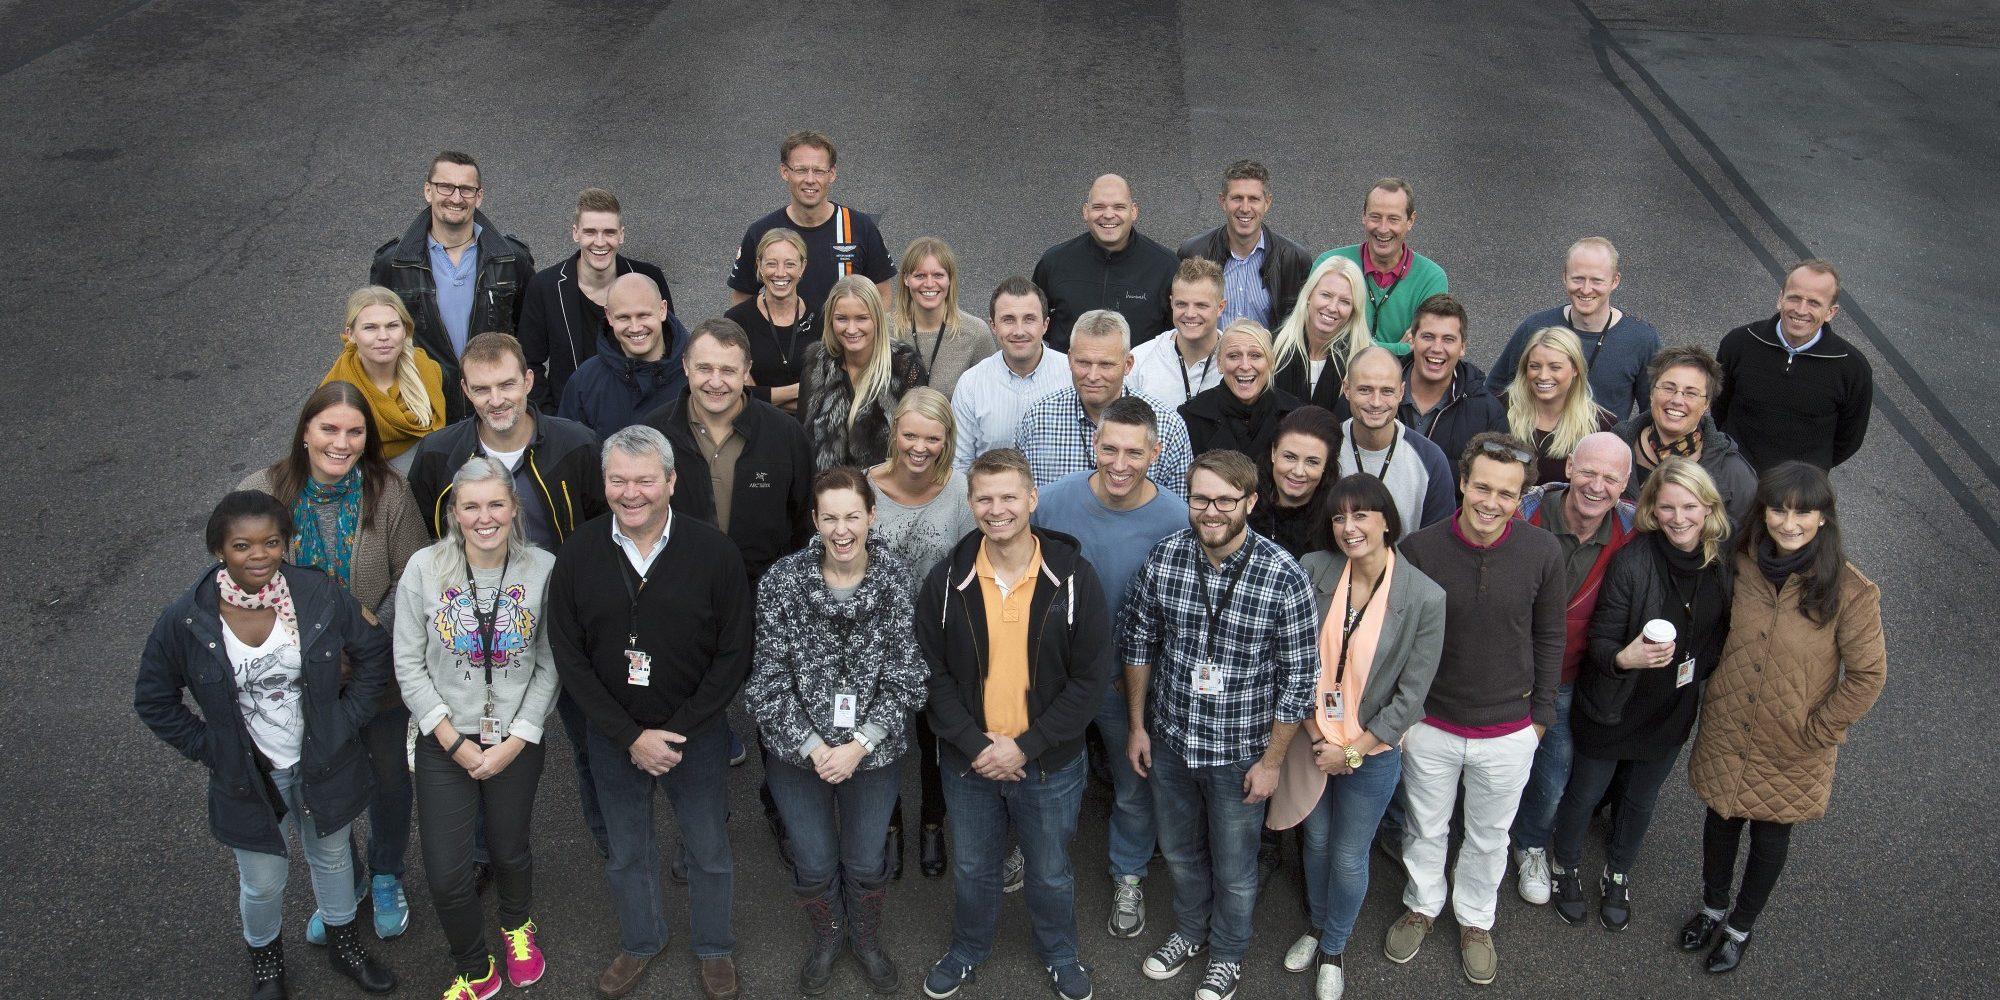 atr-gruppen-nov-2013